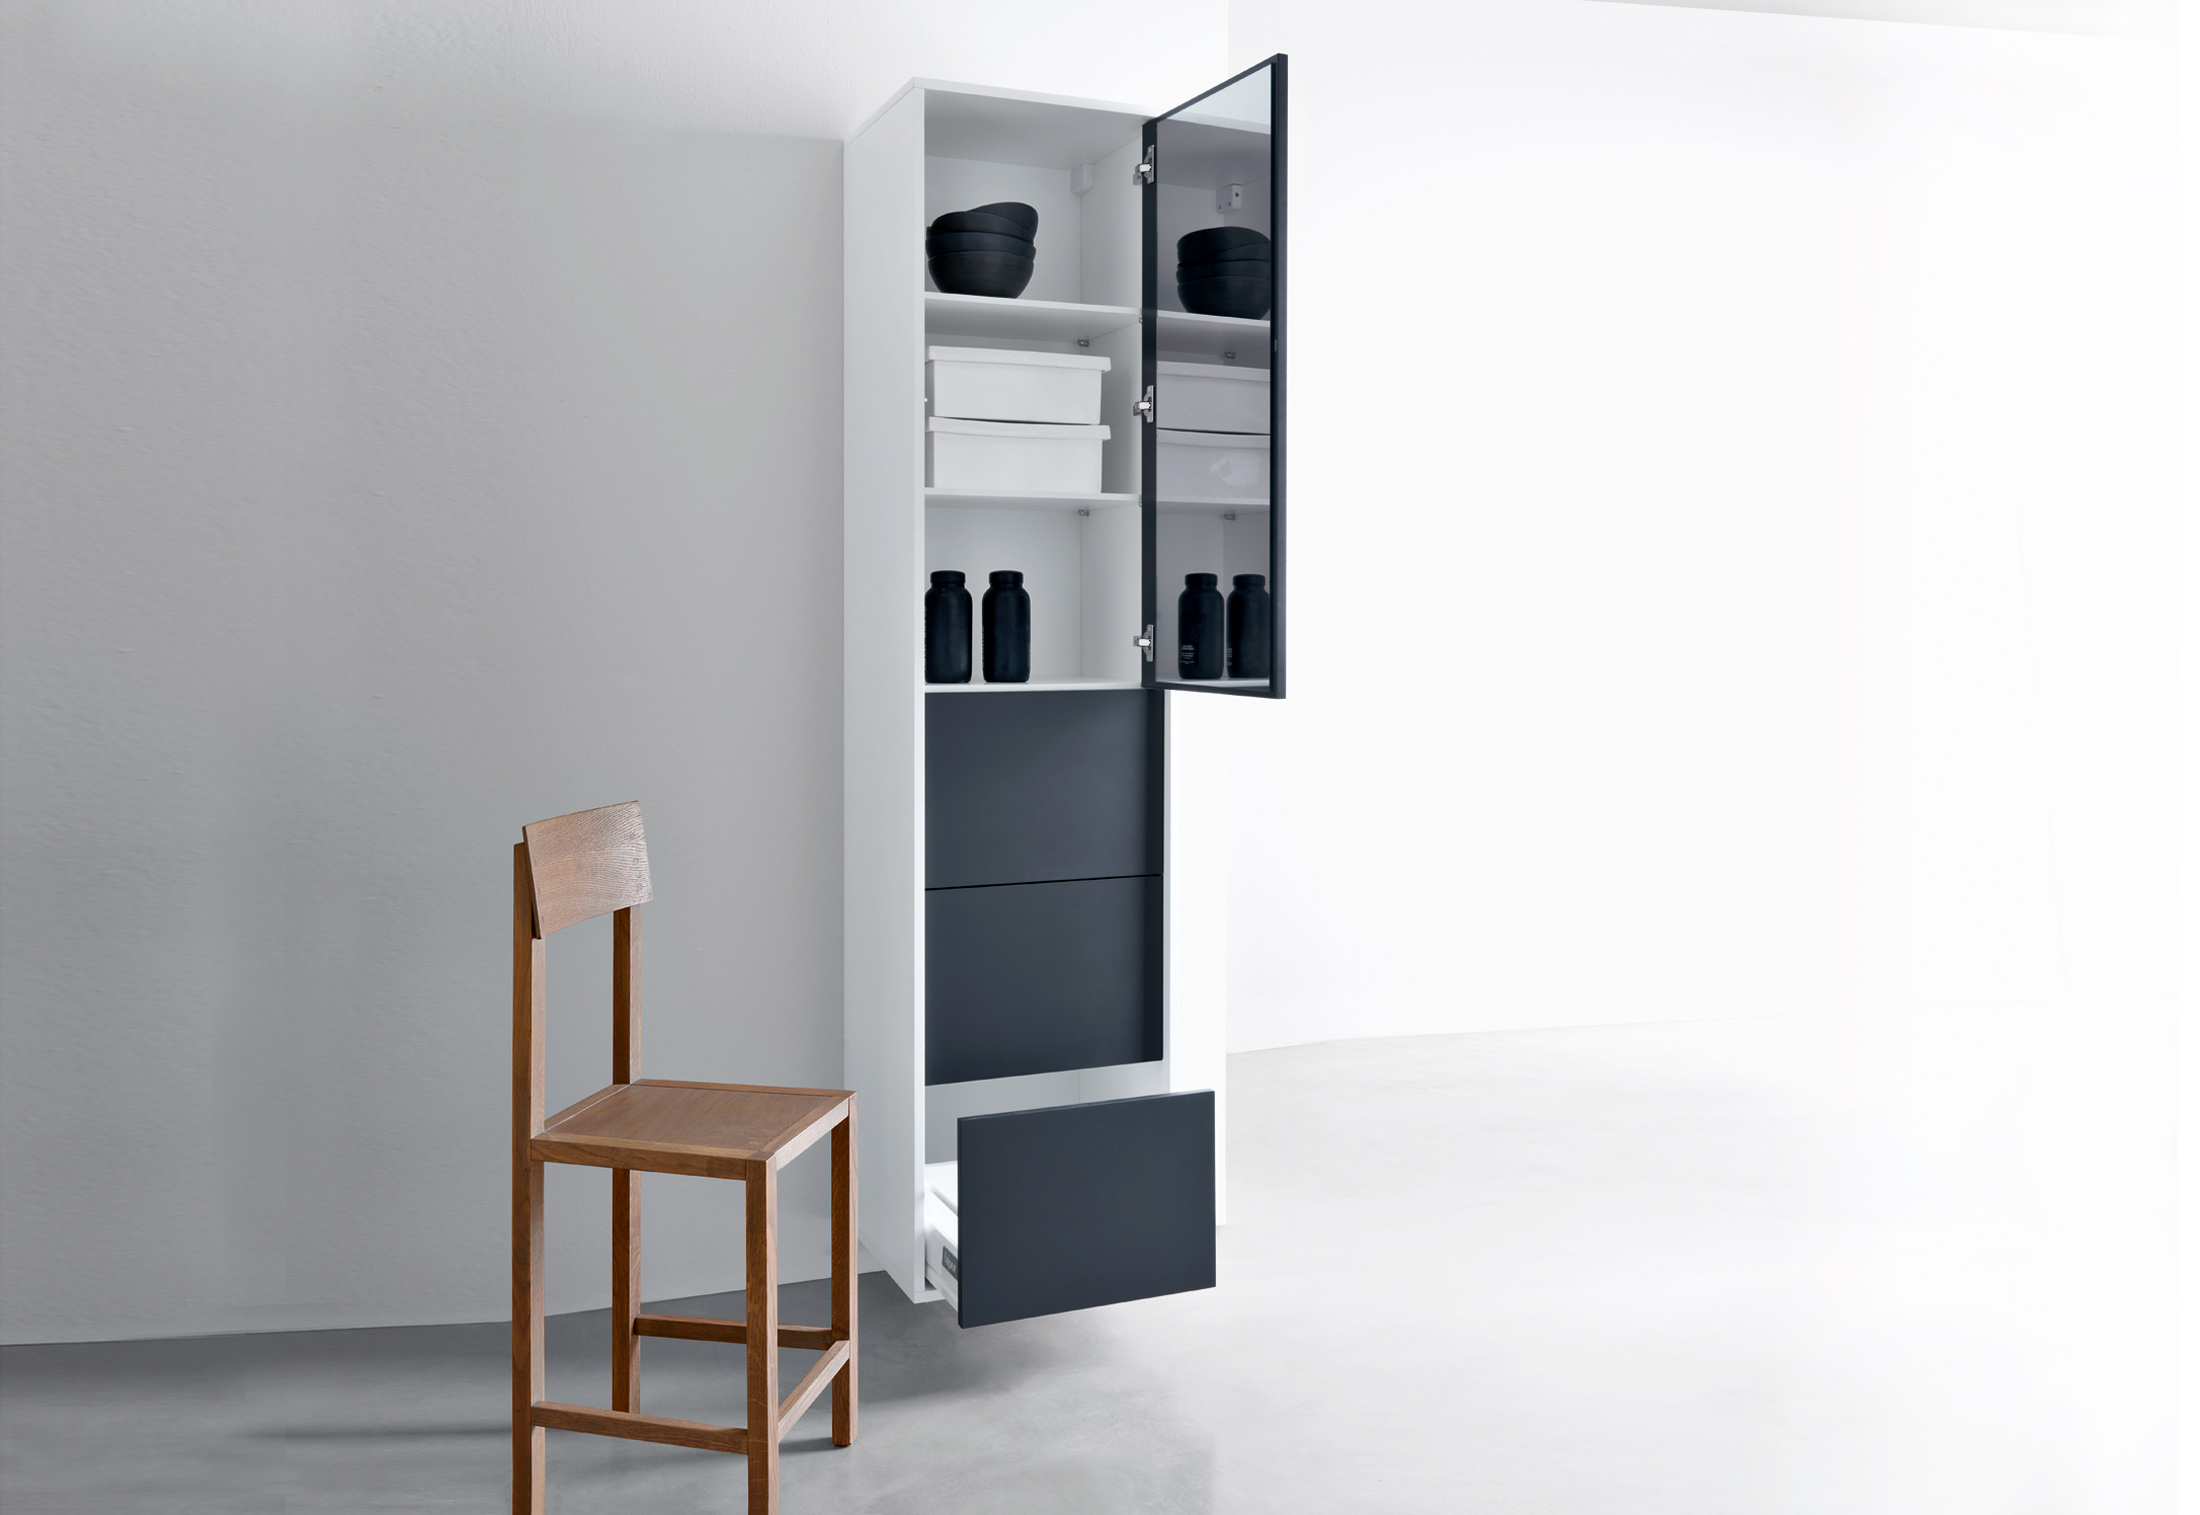 via veneto schrank von falper stylepark. Black Bedroom Furniture Sets. Home Design Ideas